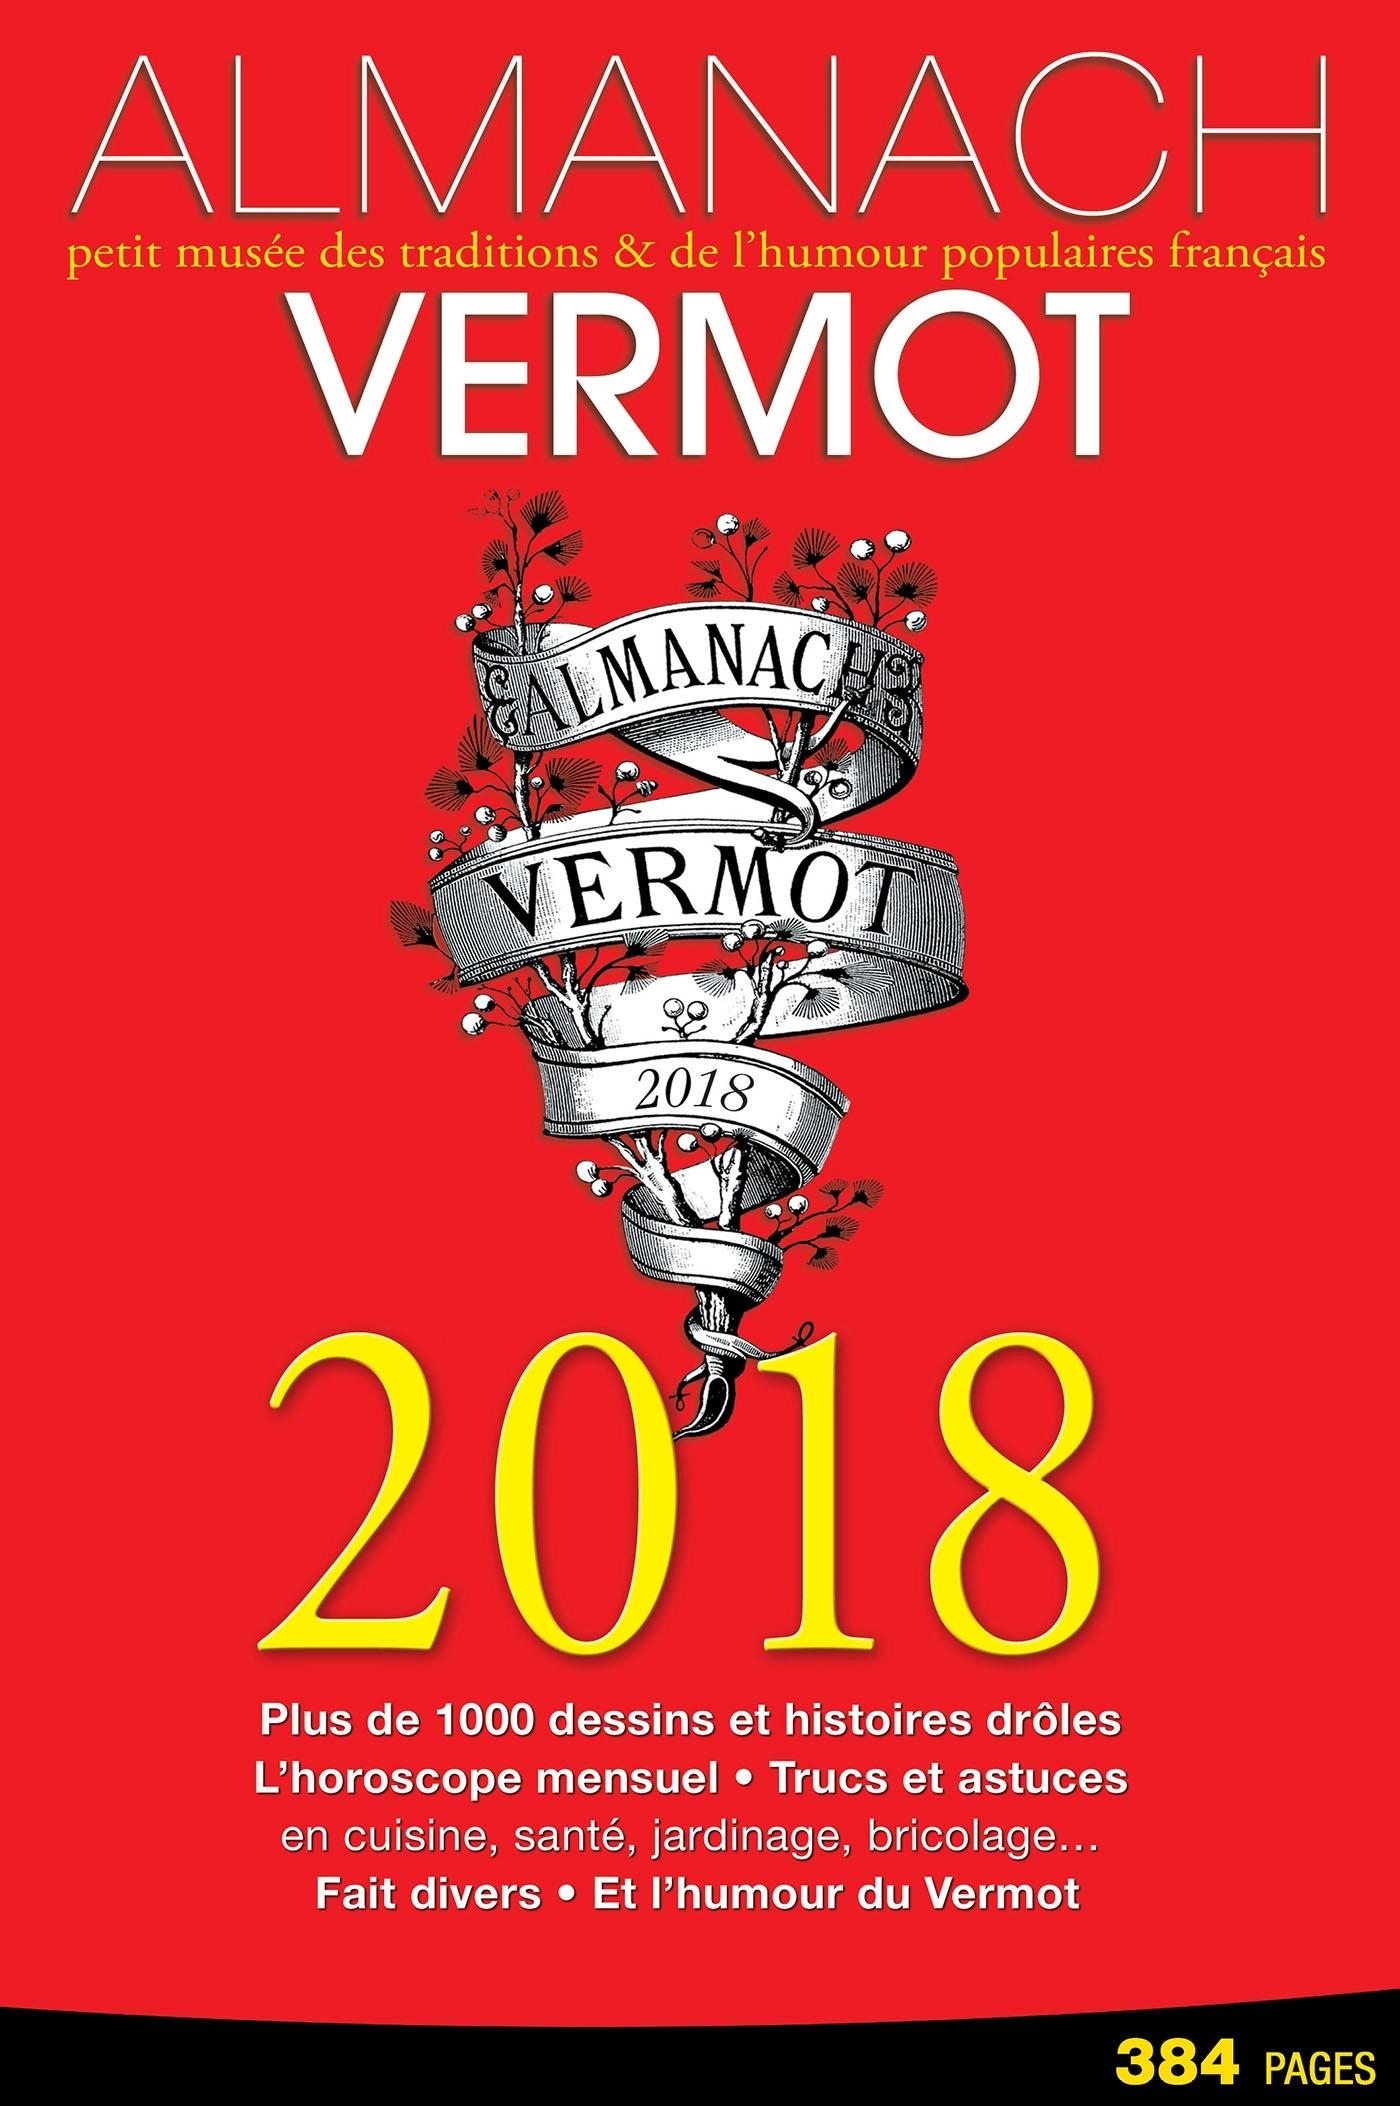 ALMANACH VERMOT 2018